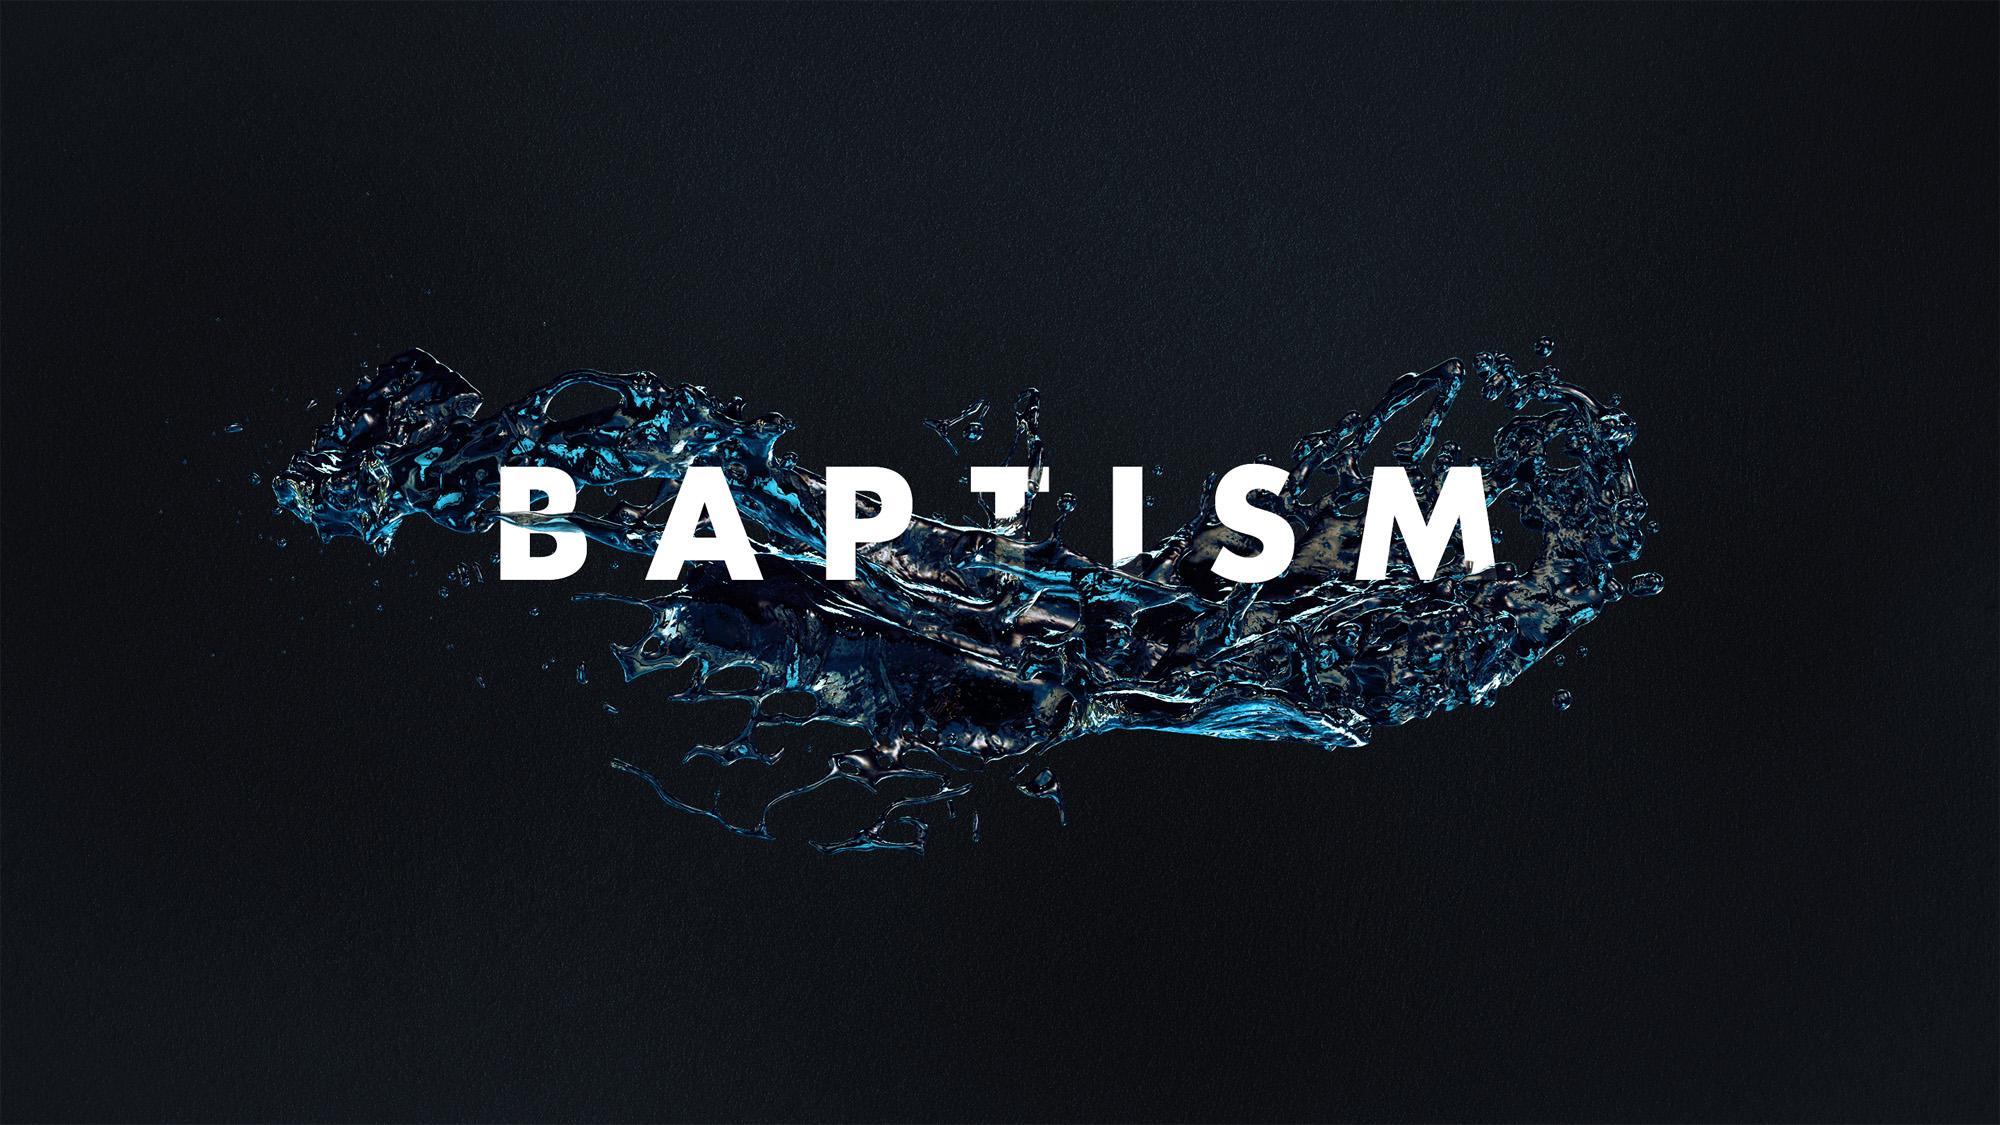 baptism-title-2-Wide 16x9